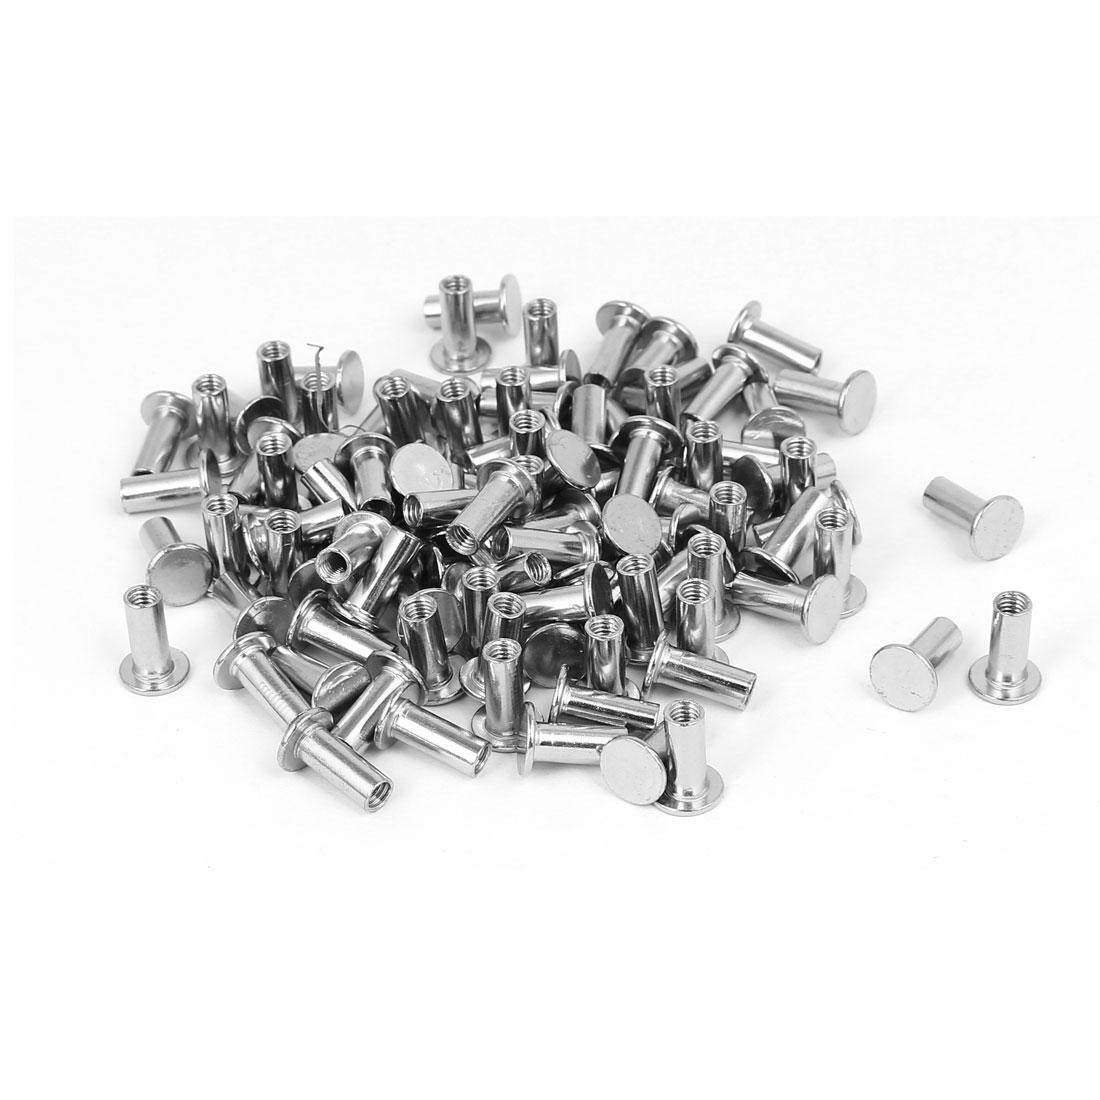 Photo Album Metal Nickel Plated Binding Screw Post Barrel Nut 5mmx12mm 100pcs